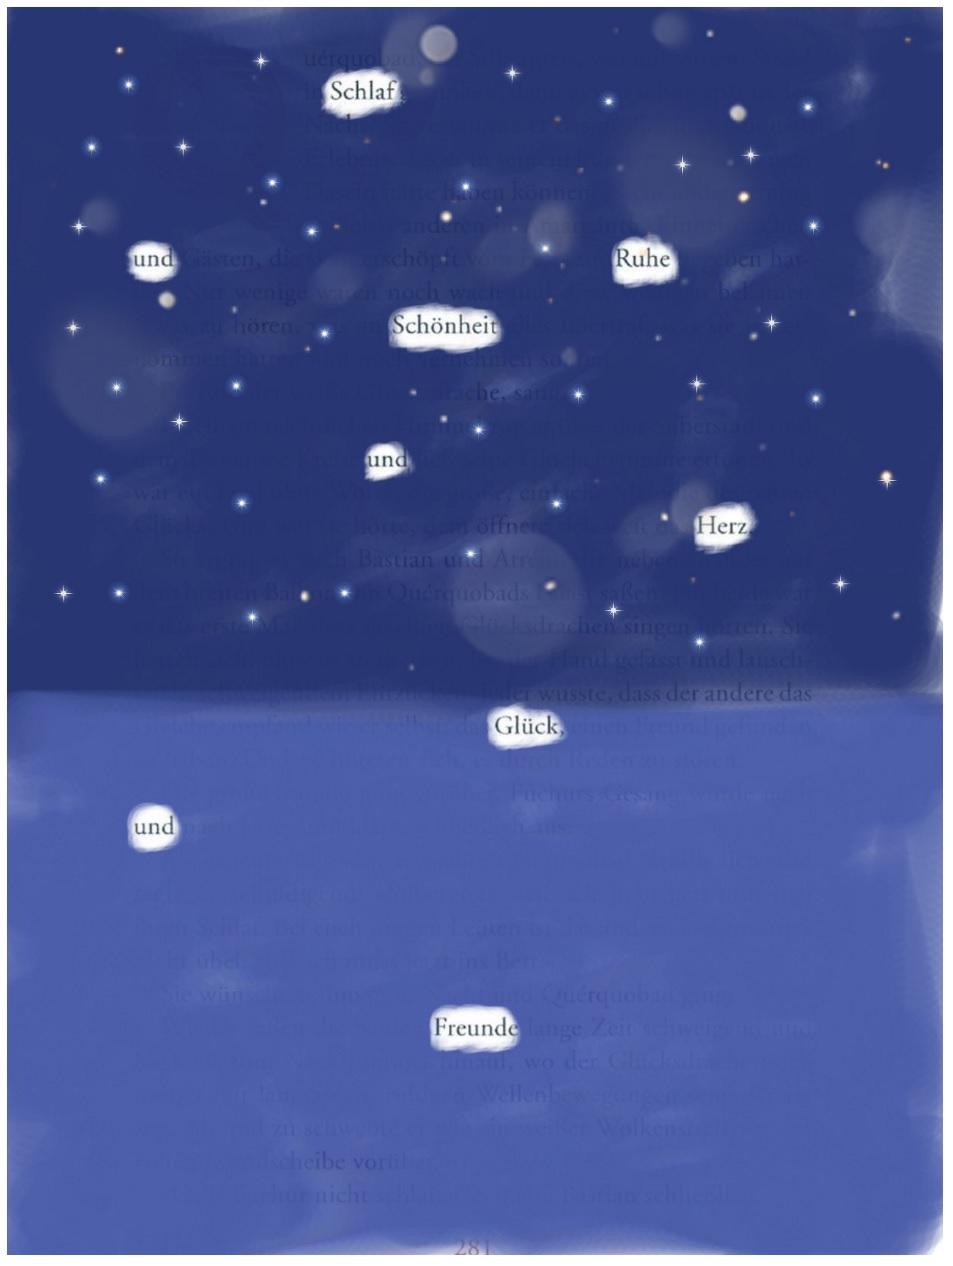 Blackout Poem, Vanessa-Maria Pavic, 5C, 2020 | Reithmanngymnasium